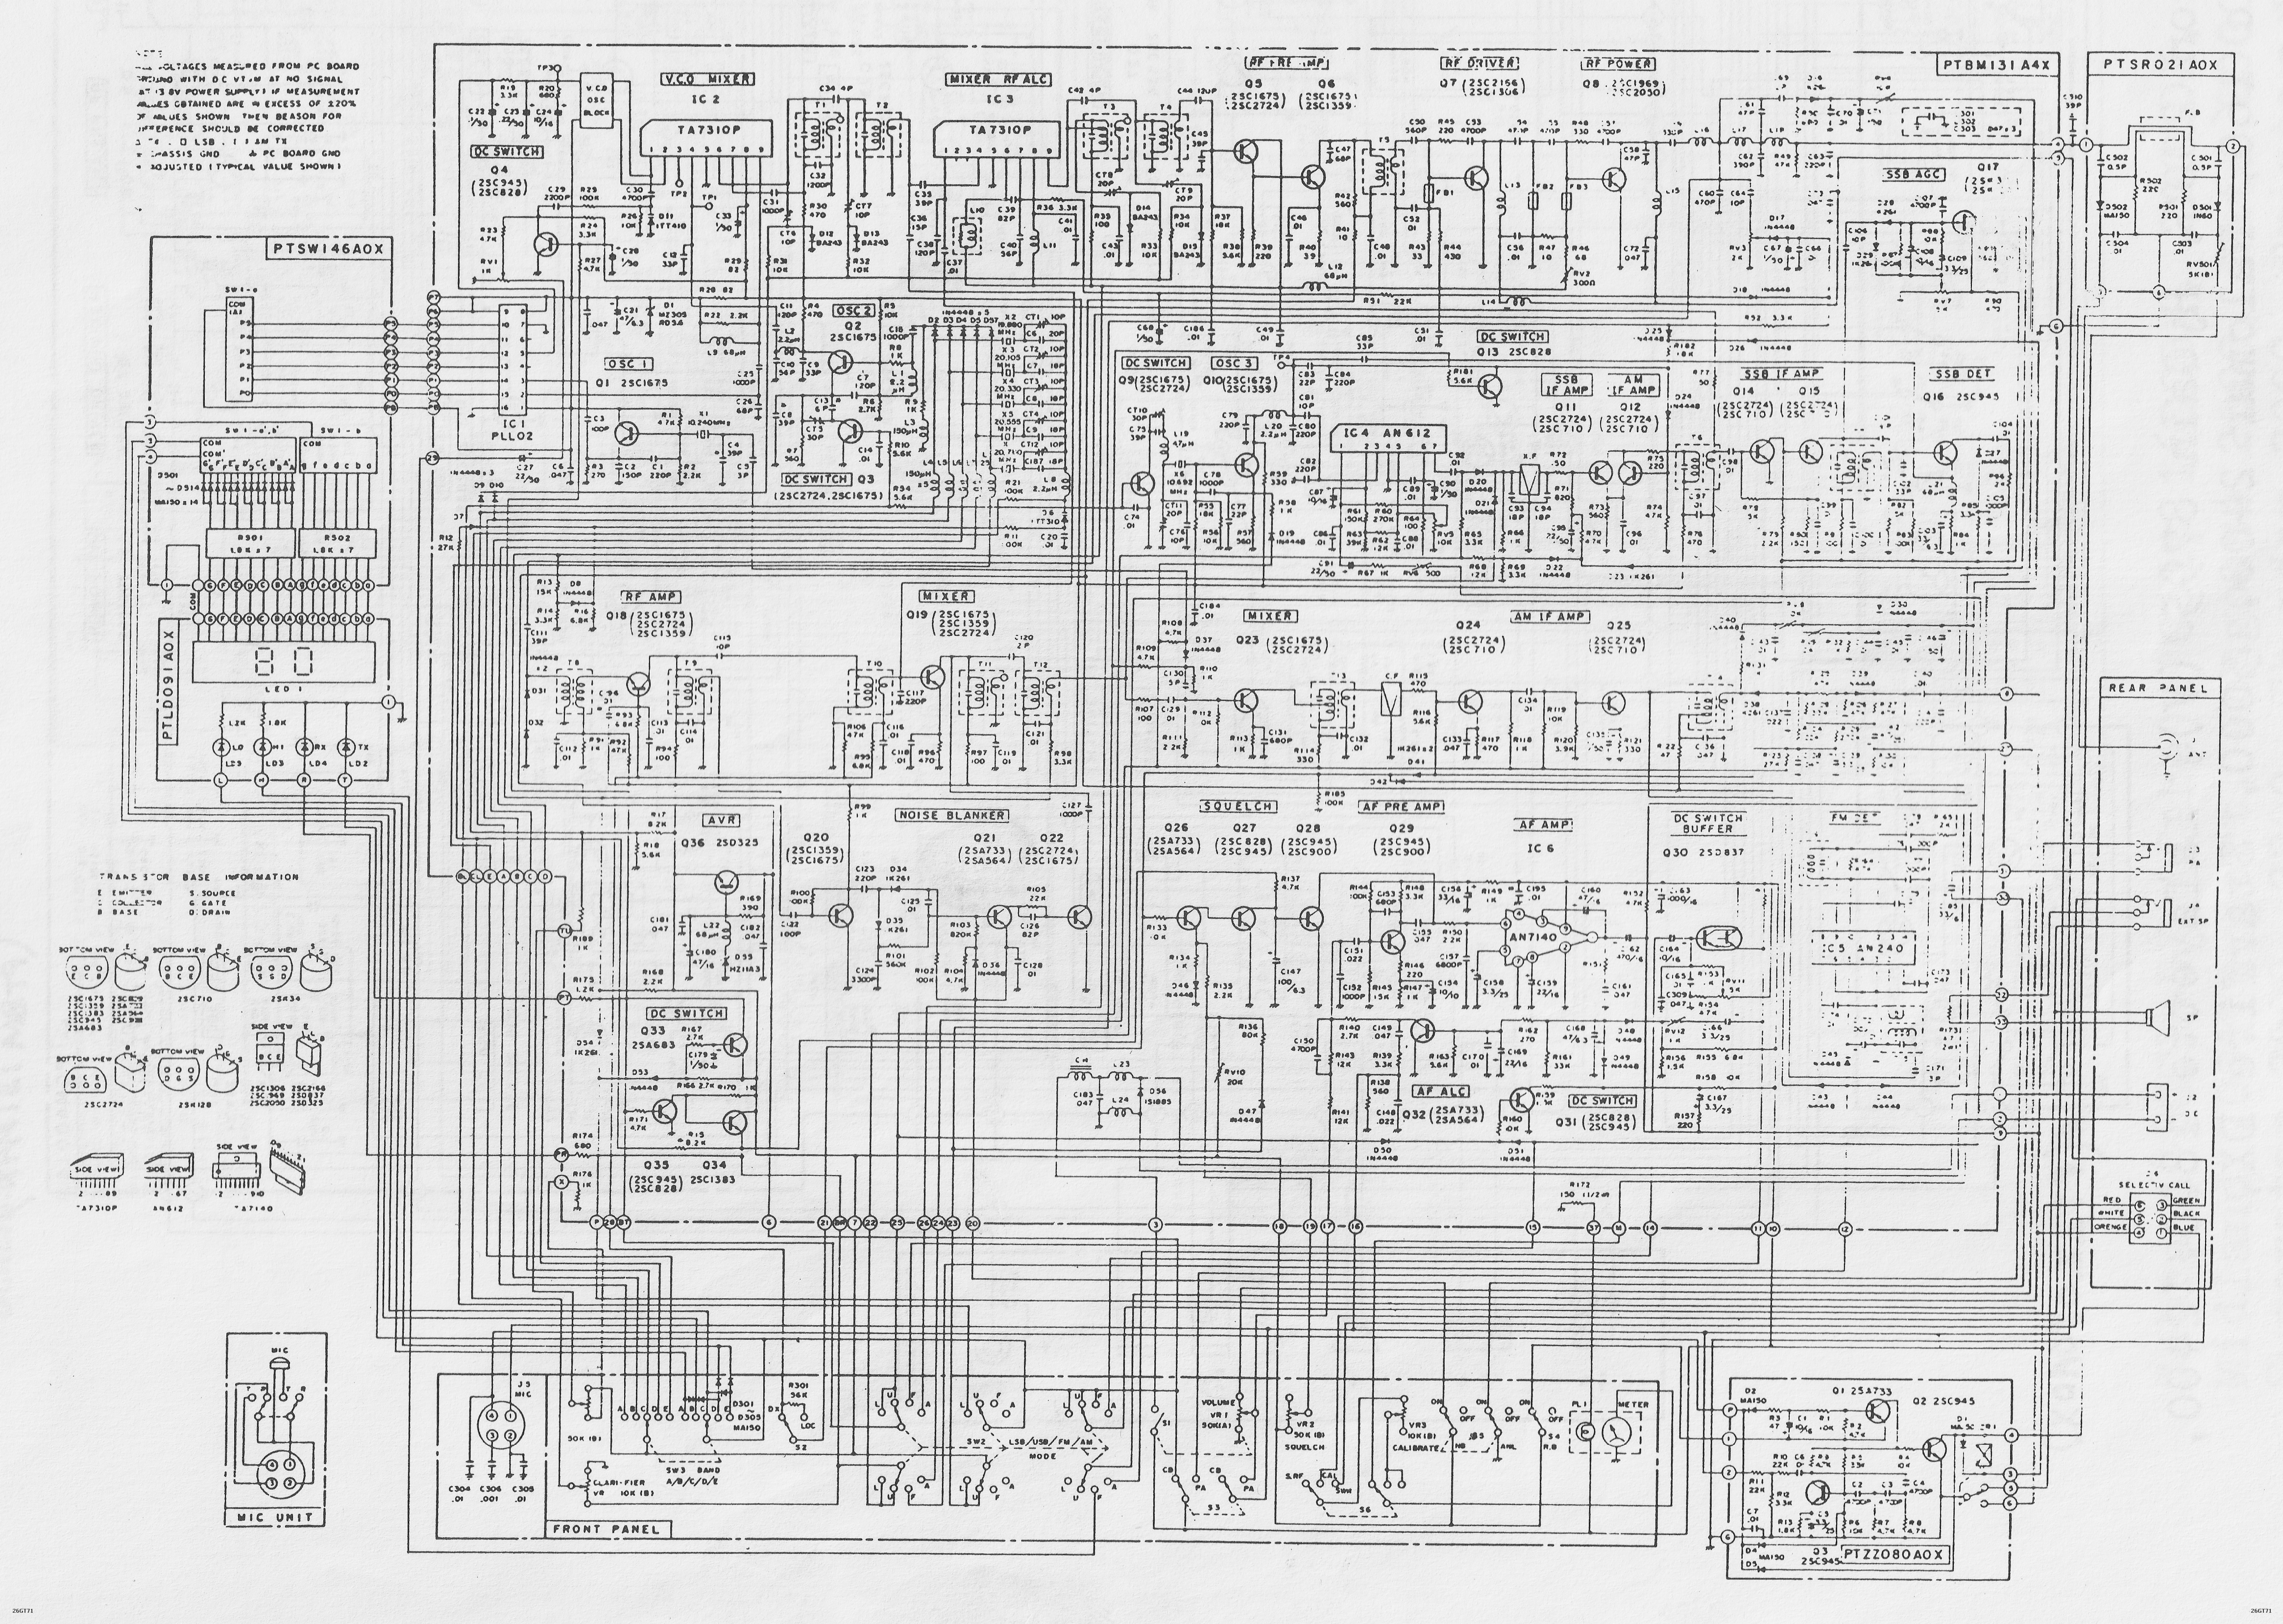 g7pvs radio data rh staffordengineeringsystems co uk Schematic Diagram Example HVAC Diagrams Schematics